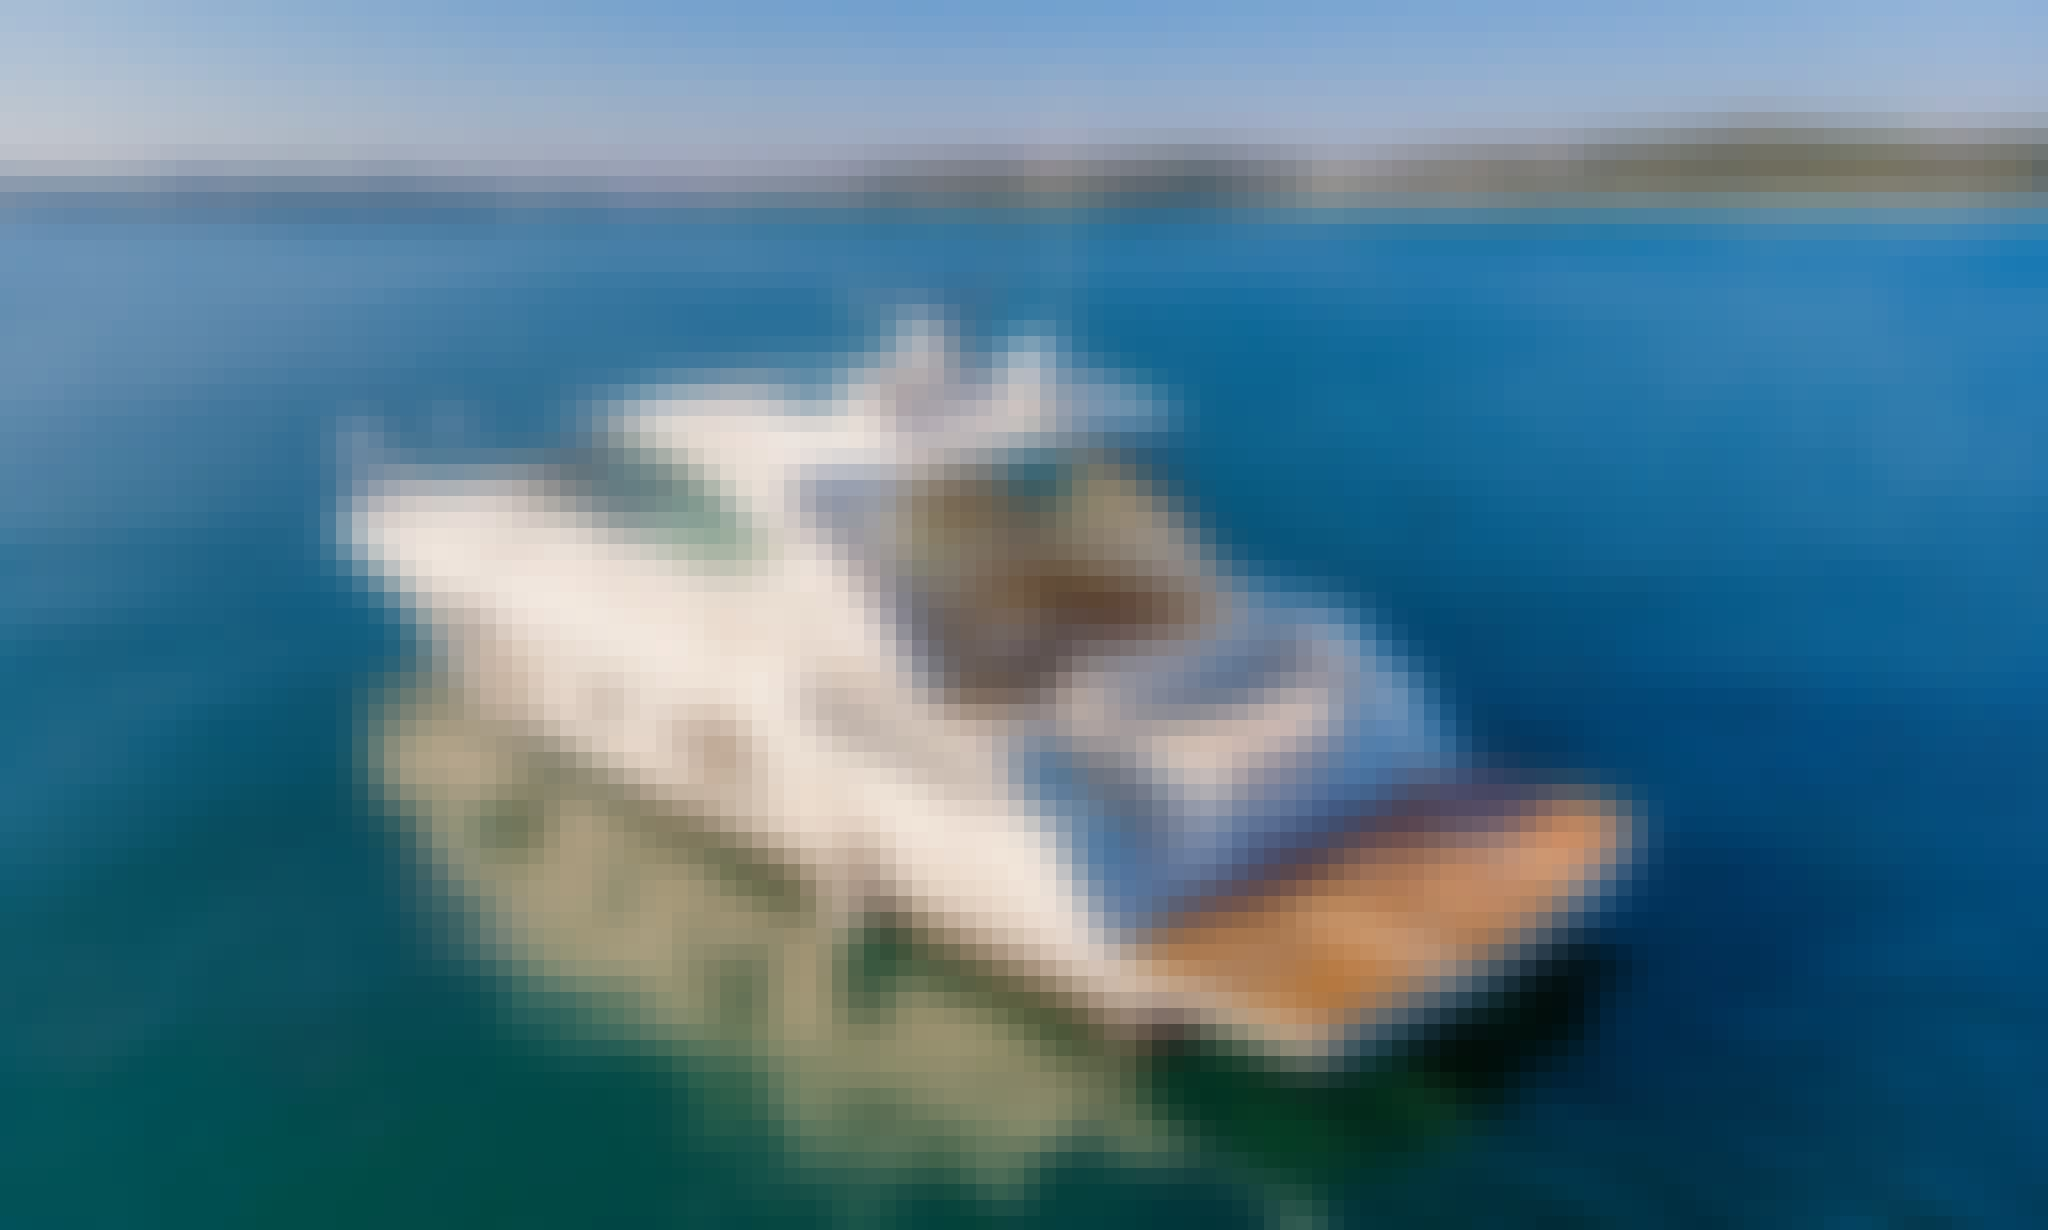 Yacht Charter | Chartered Yacht Rental | Austin Texas